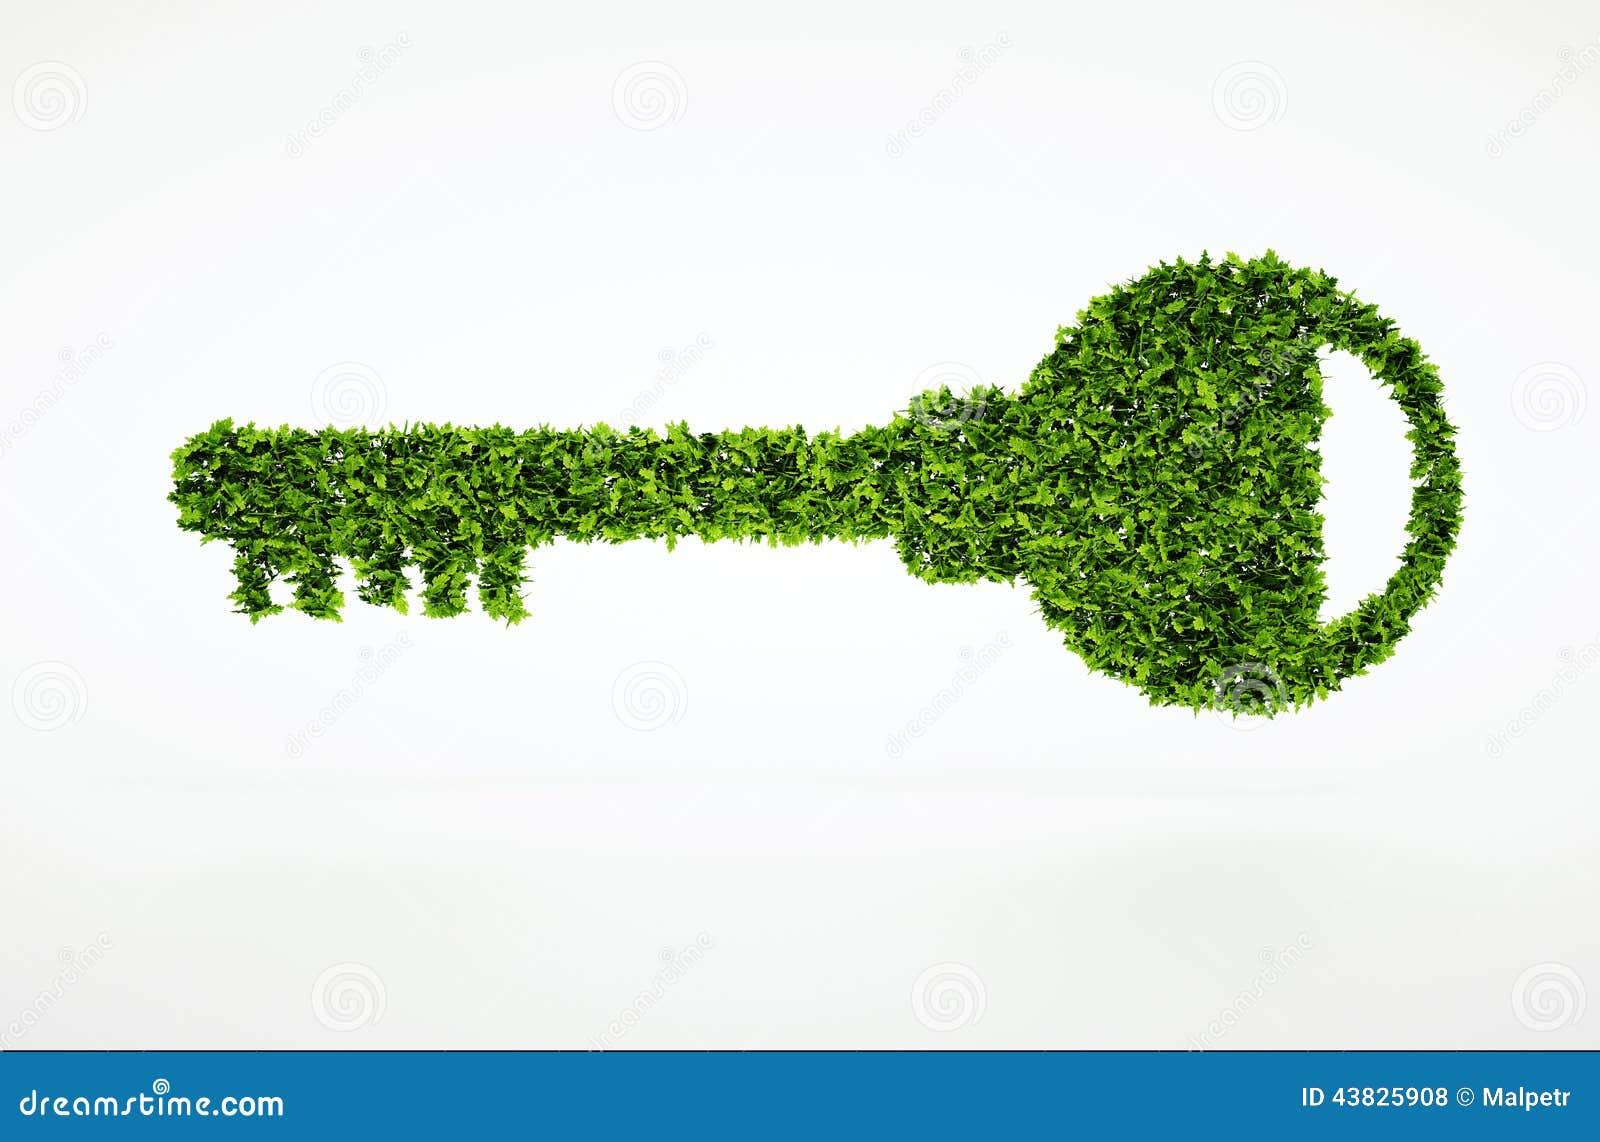 Ecology Natural Key Symbol With White Background Stock Illustration